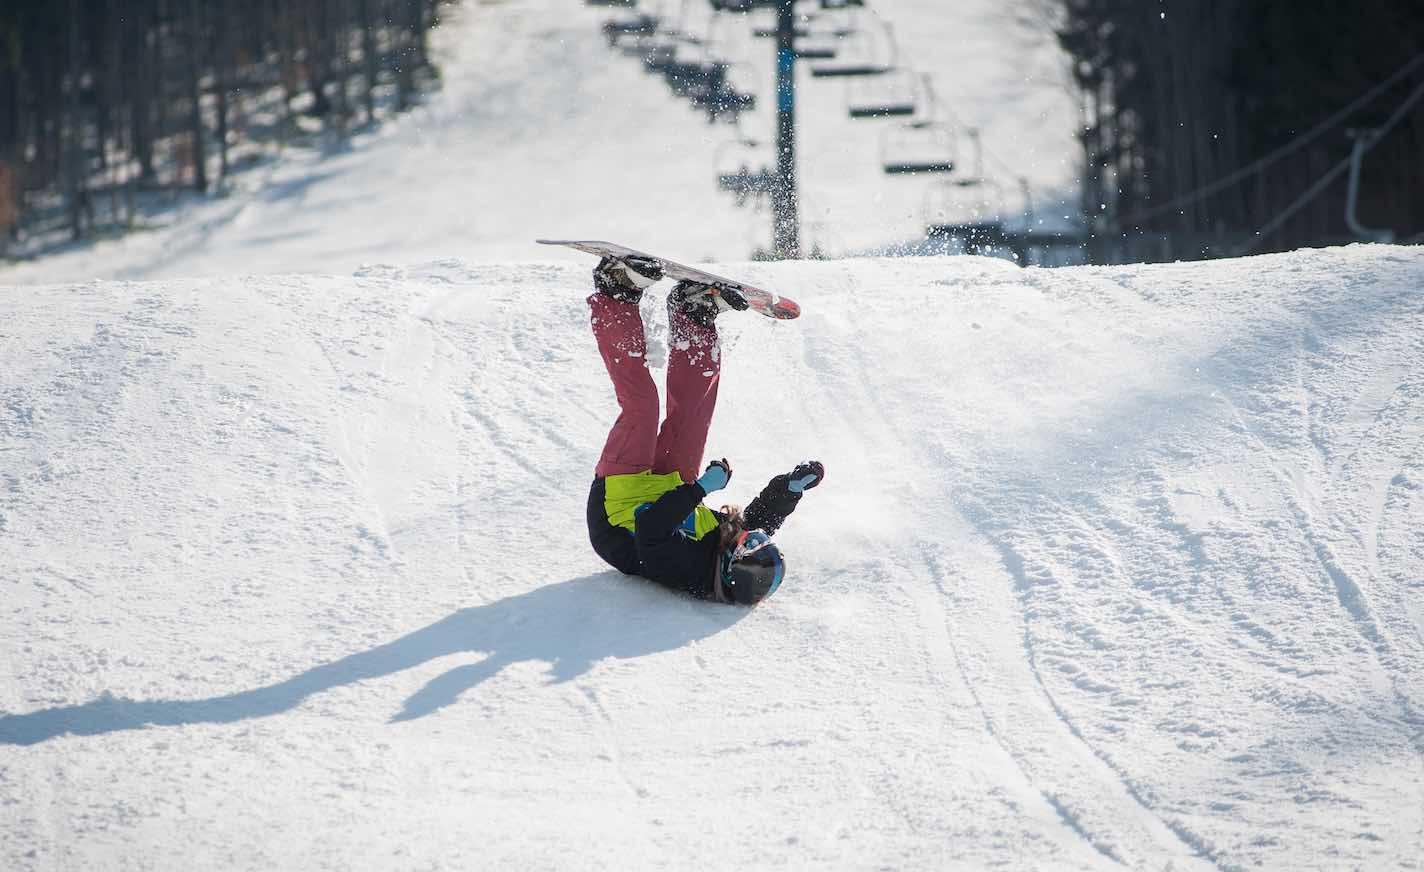 caida snowboard lesion